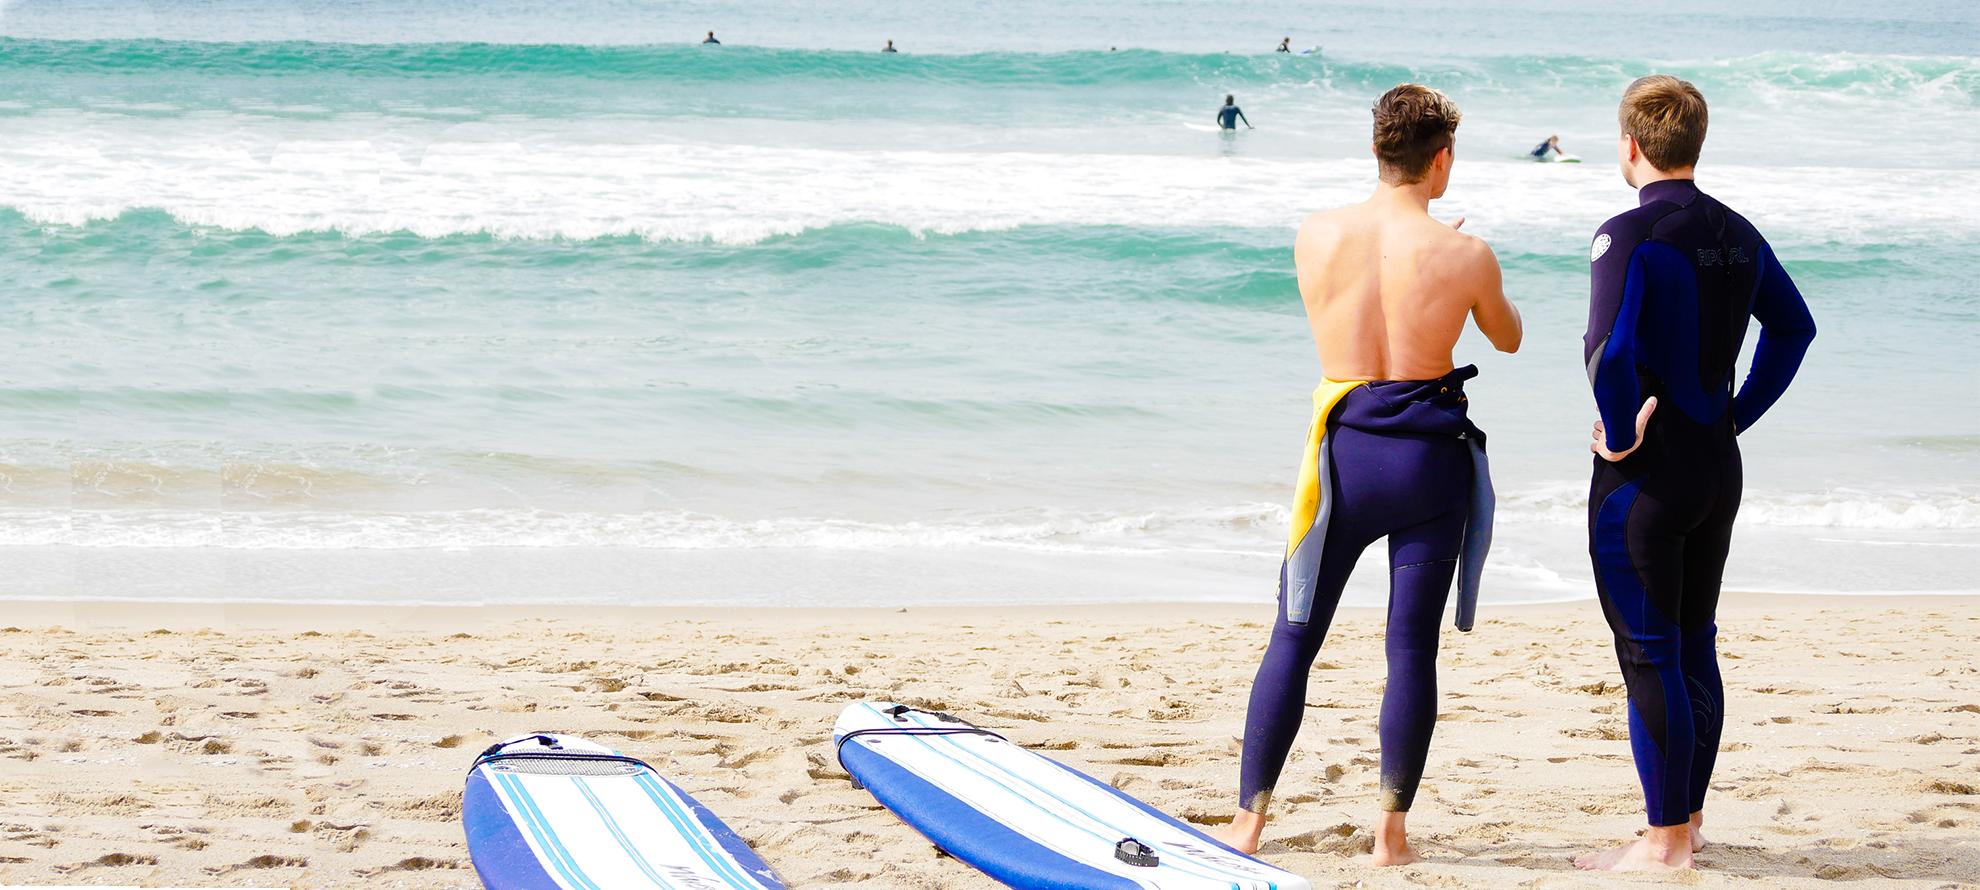 уроки серфинга, лос анджелес, калифорния